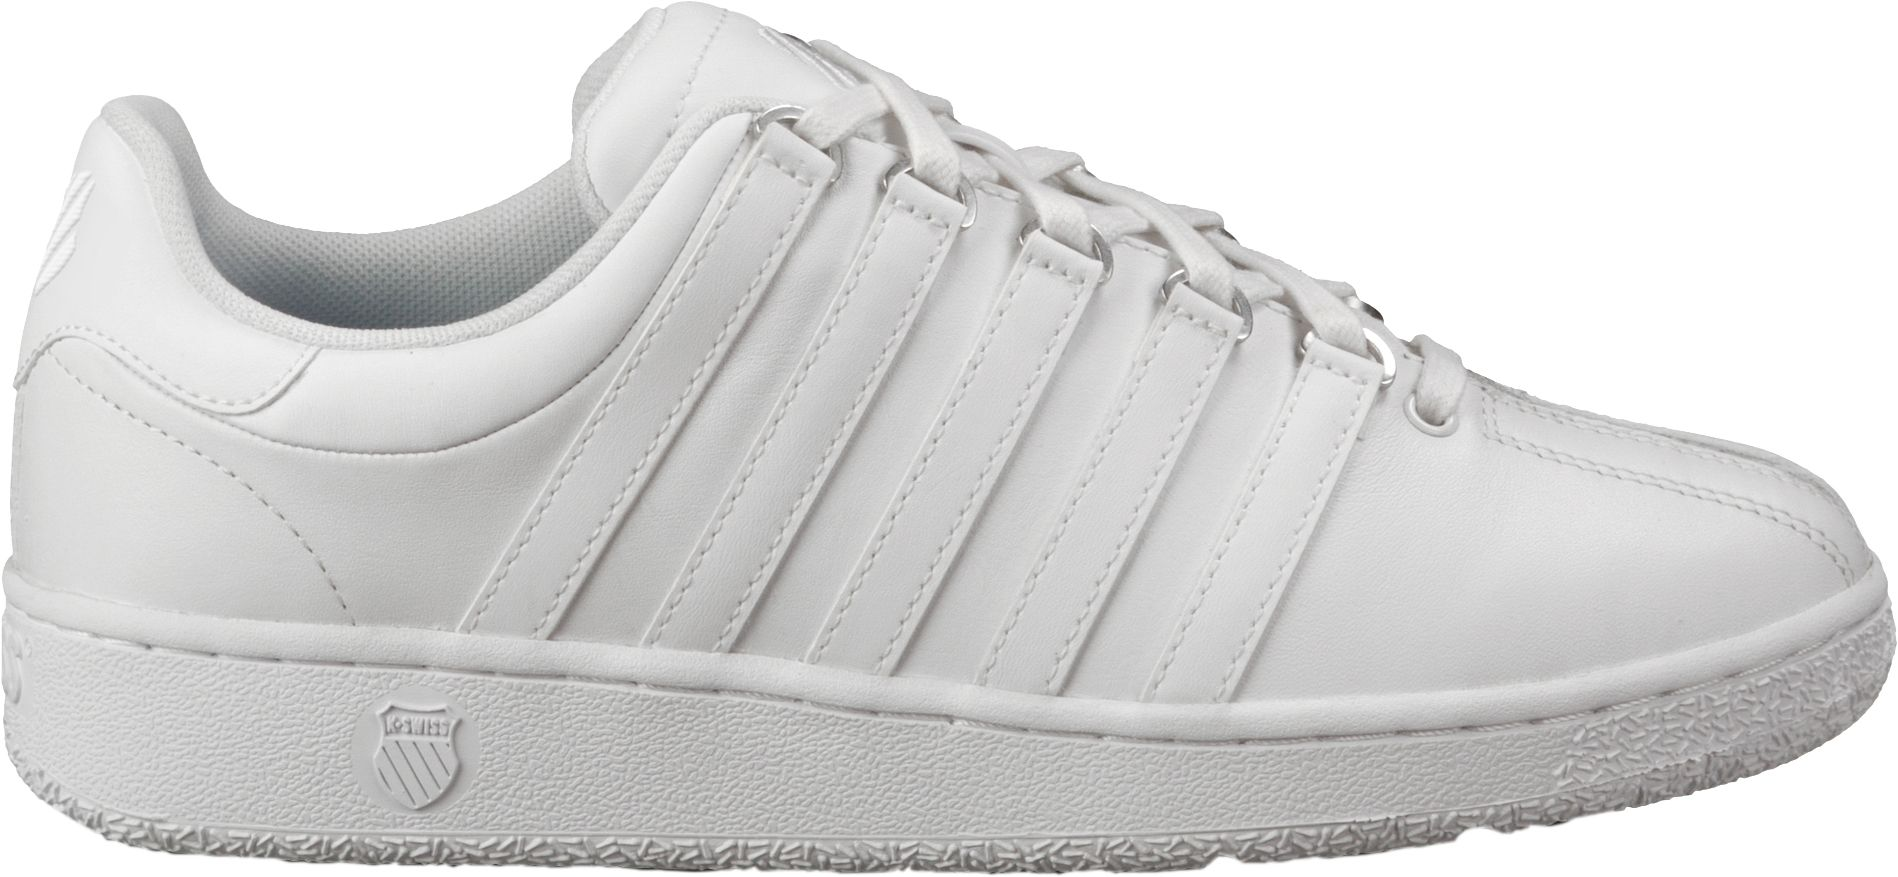 K-Swiss Men's Classic VN Shoes. 0:00. 0:00 / 0:00. noImageFound ???